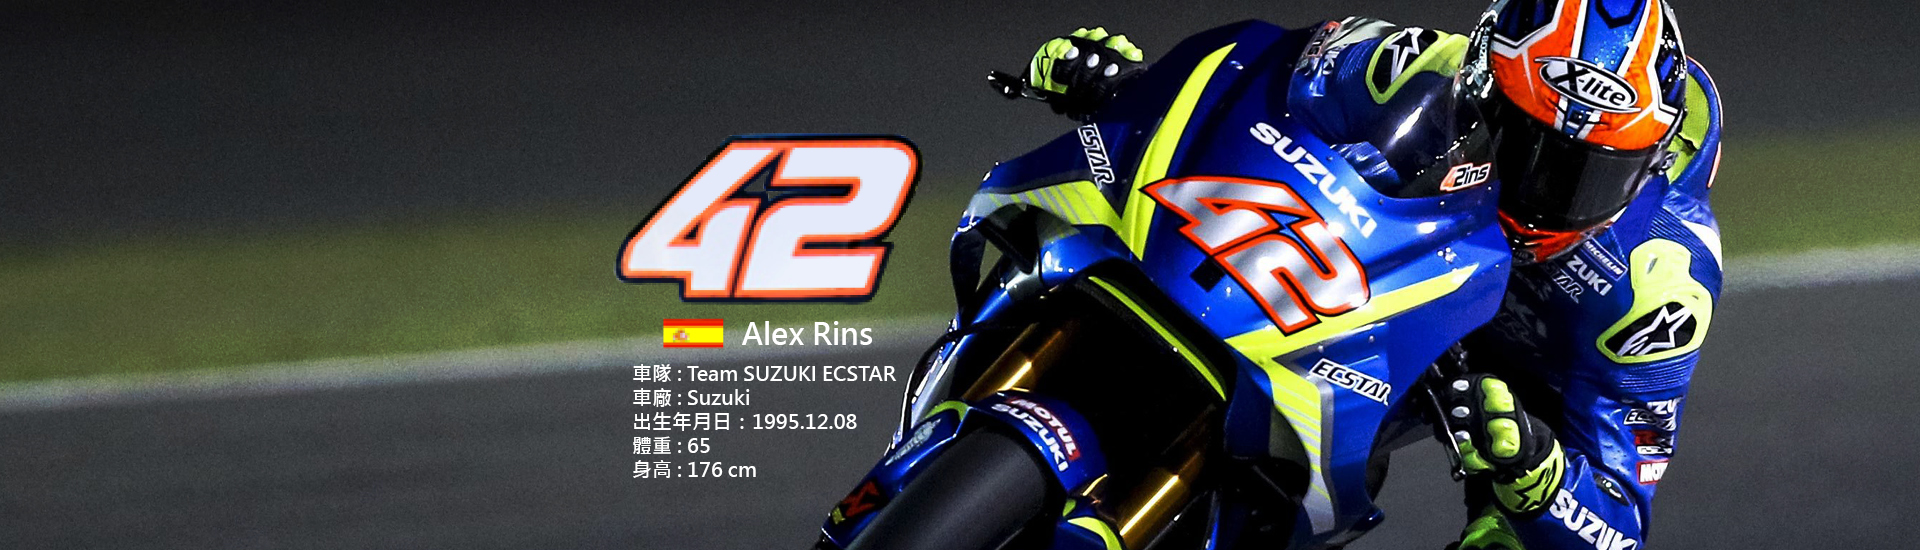 2018 MotoGP 【42】Alex Rins